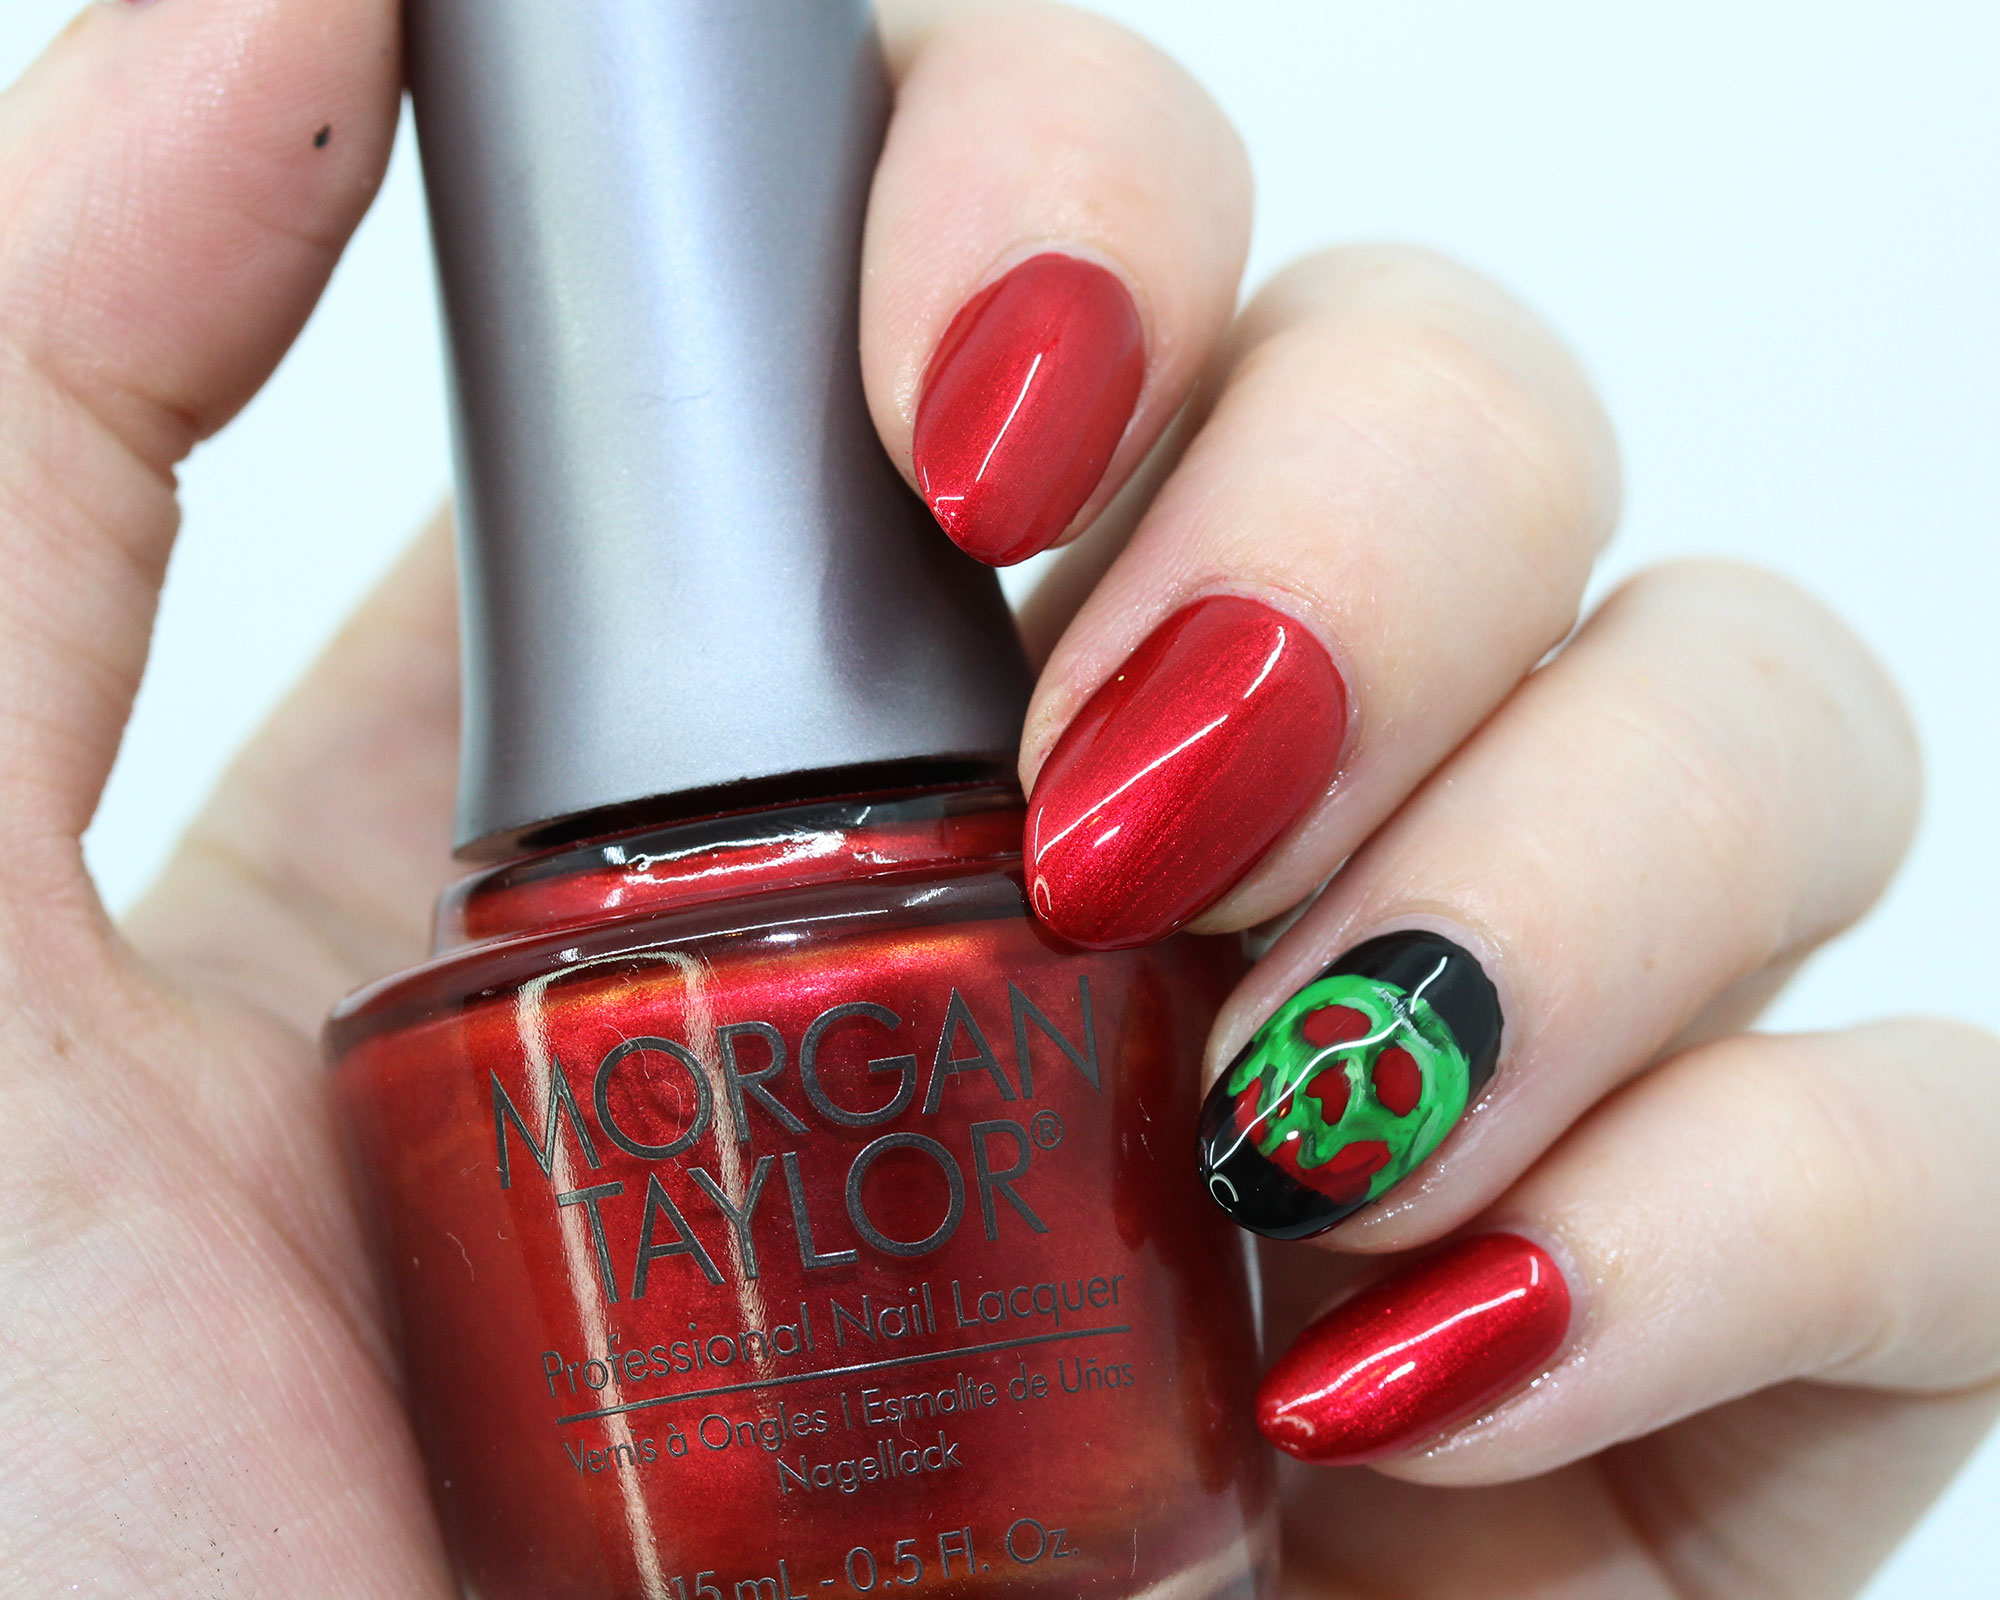 Morgan Taylor Just One Bite - Disney Evil Queen inspired nail polish